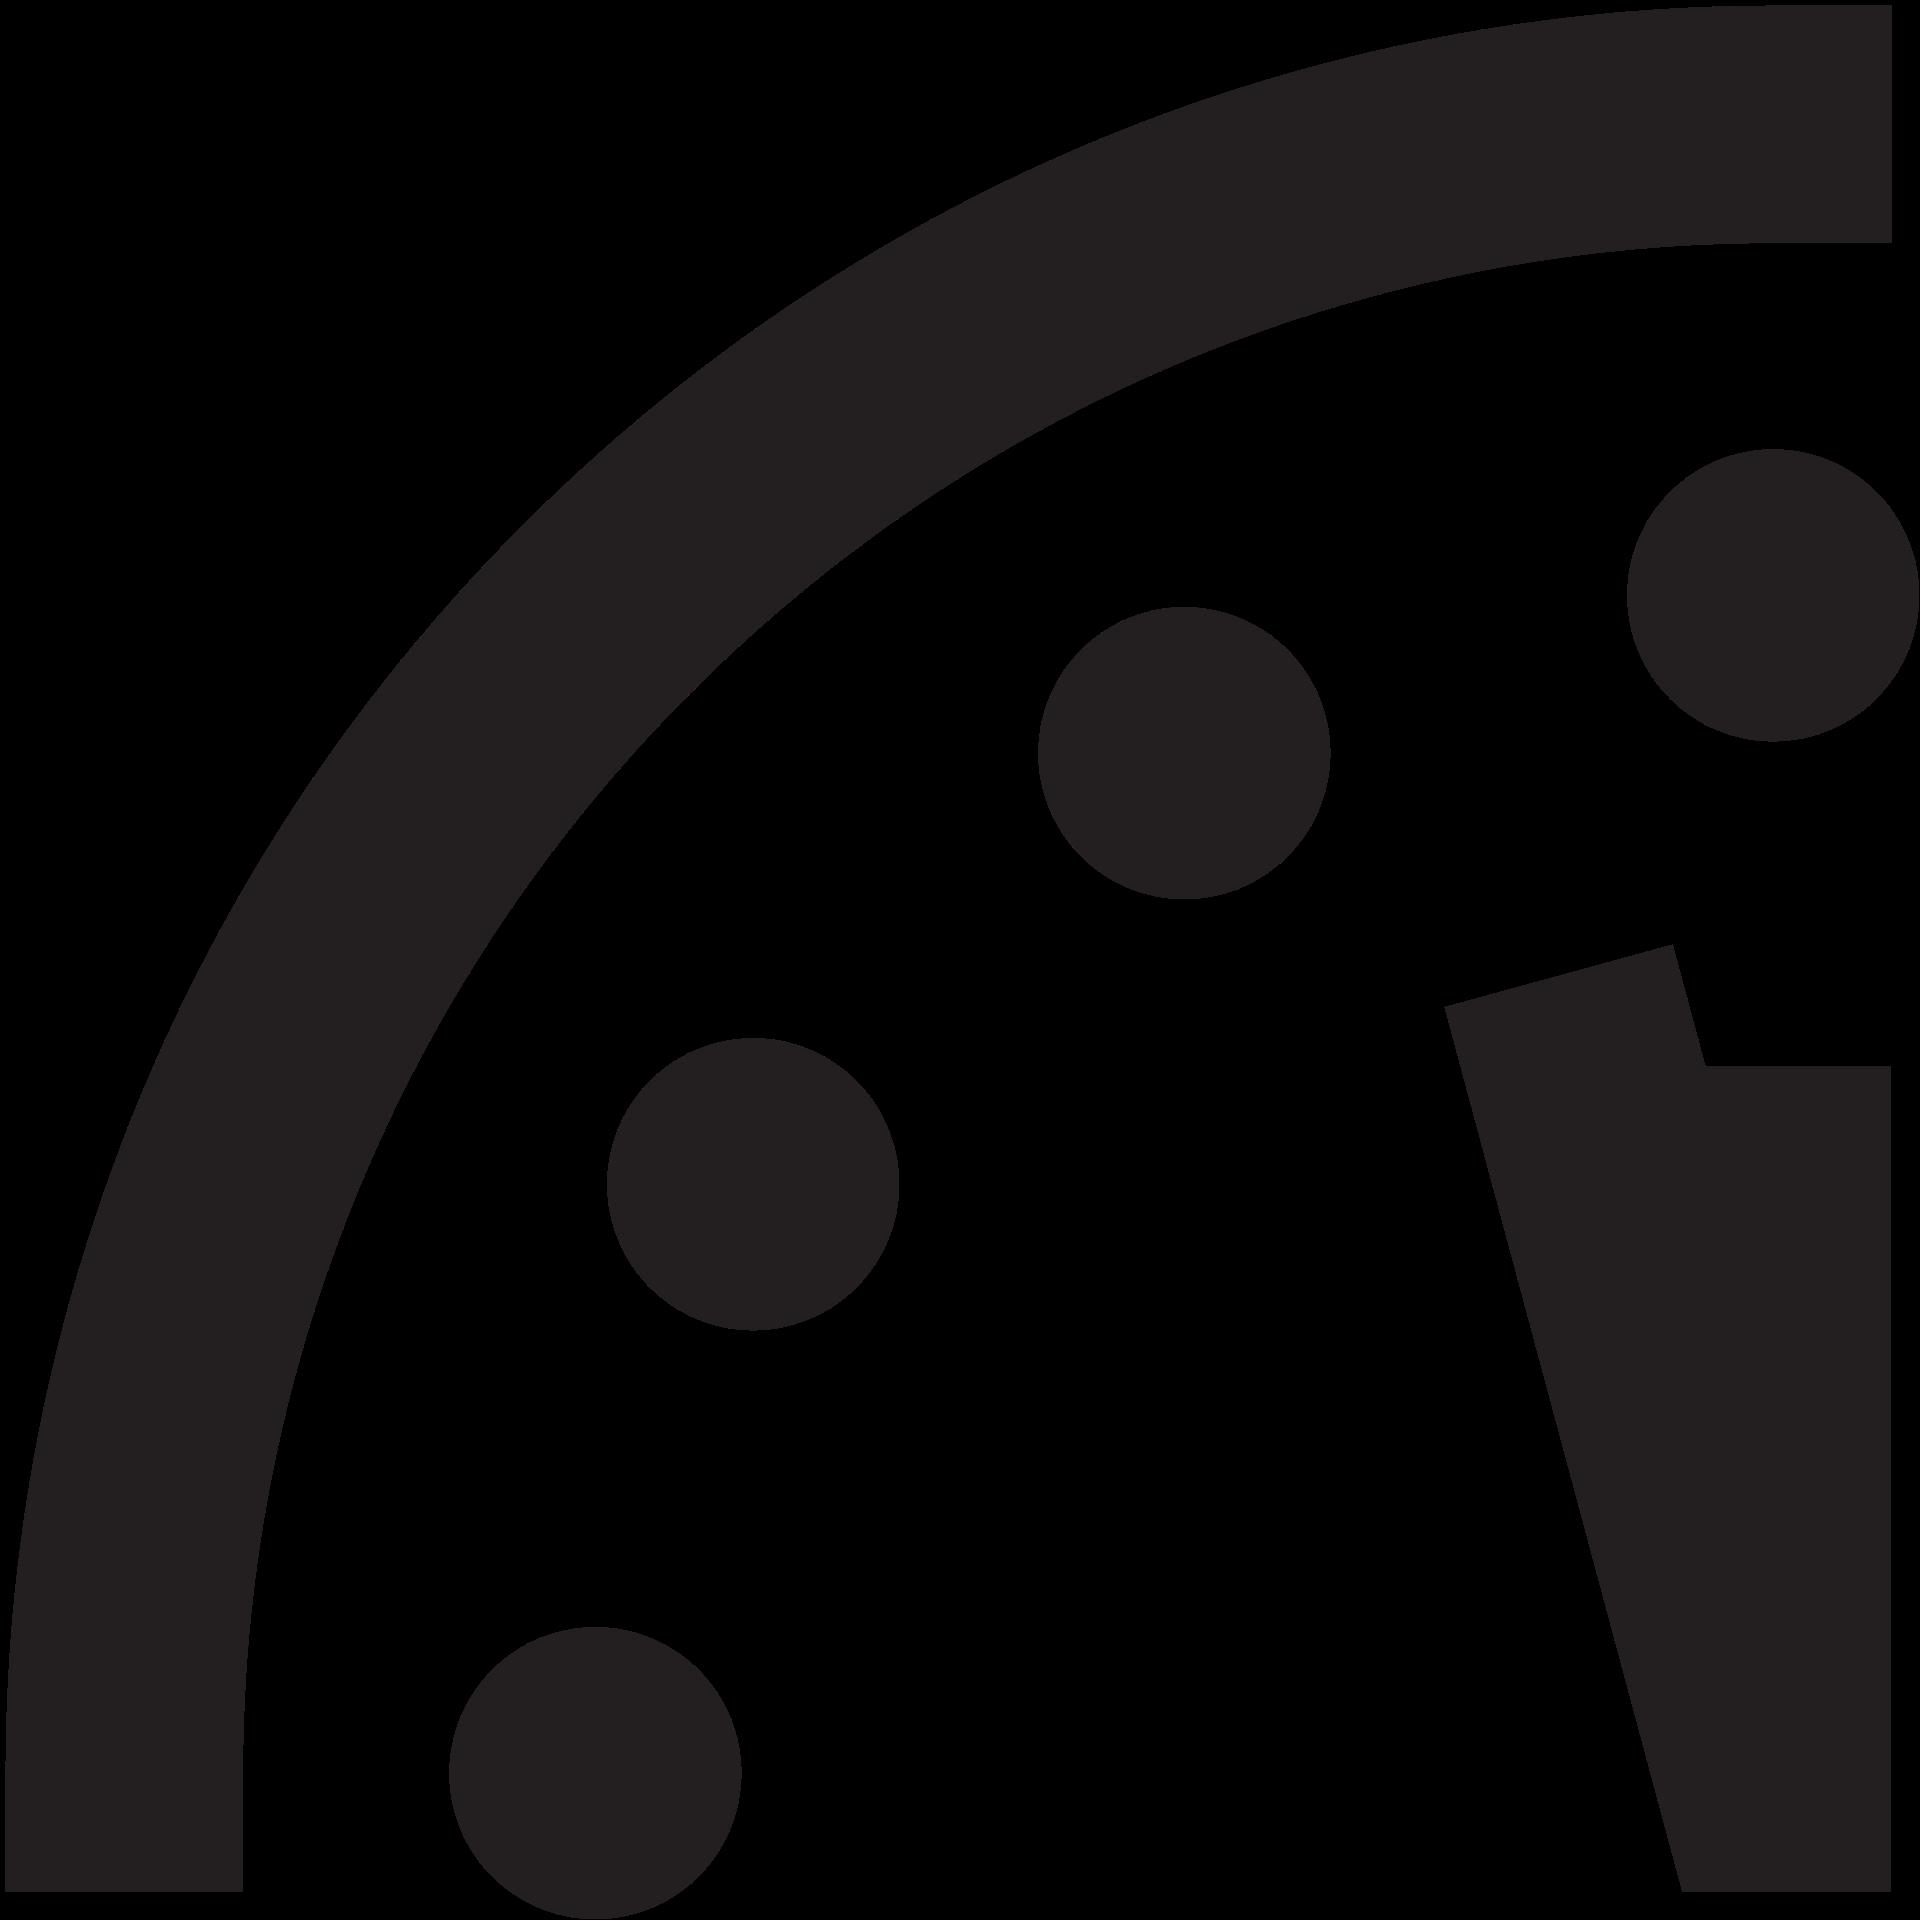 doomsday clock - photo #5